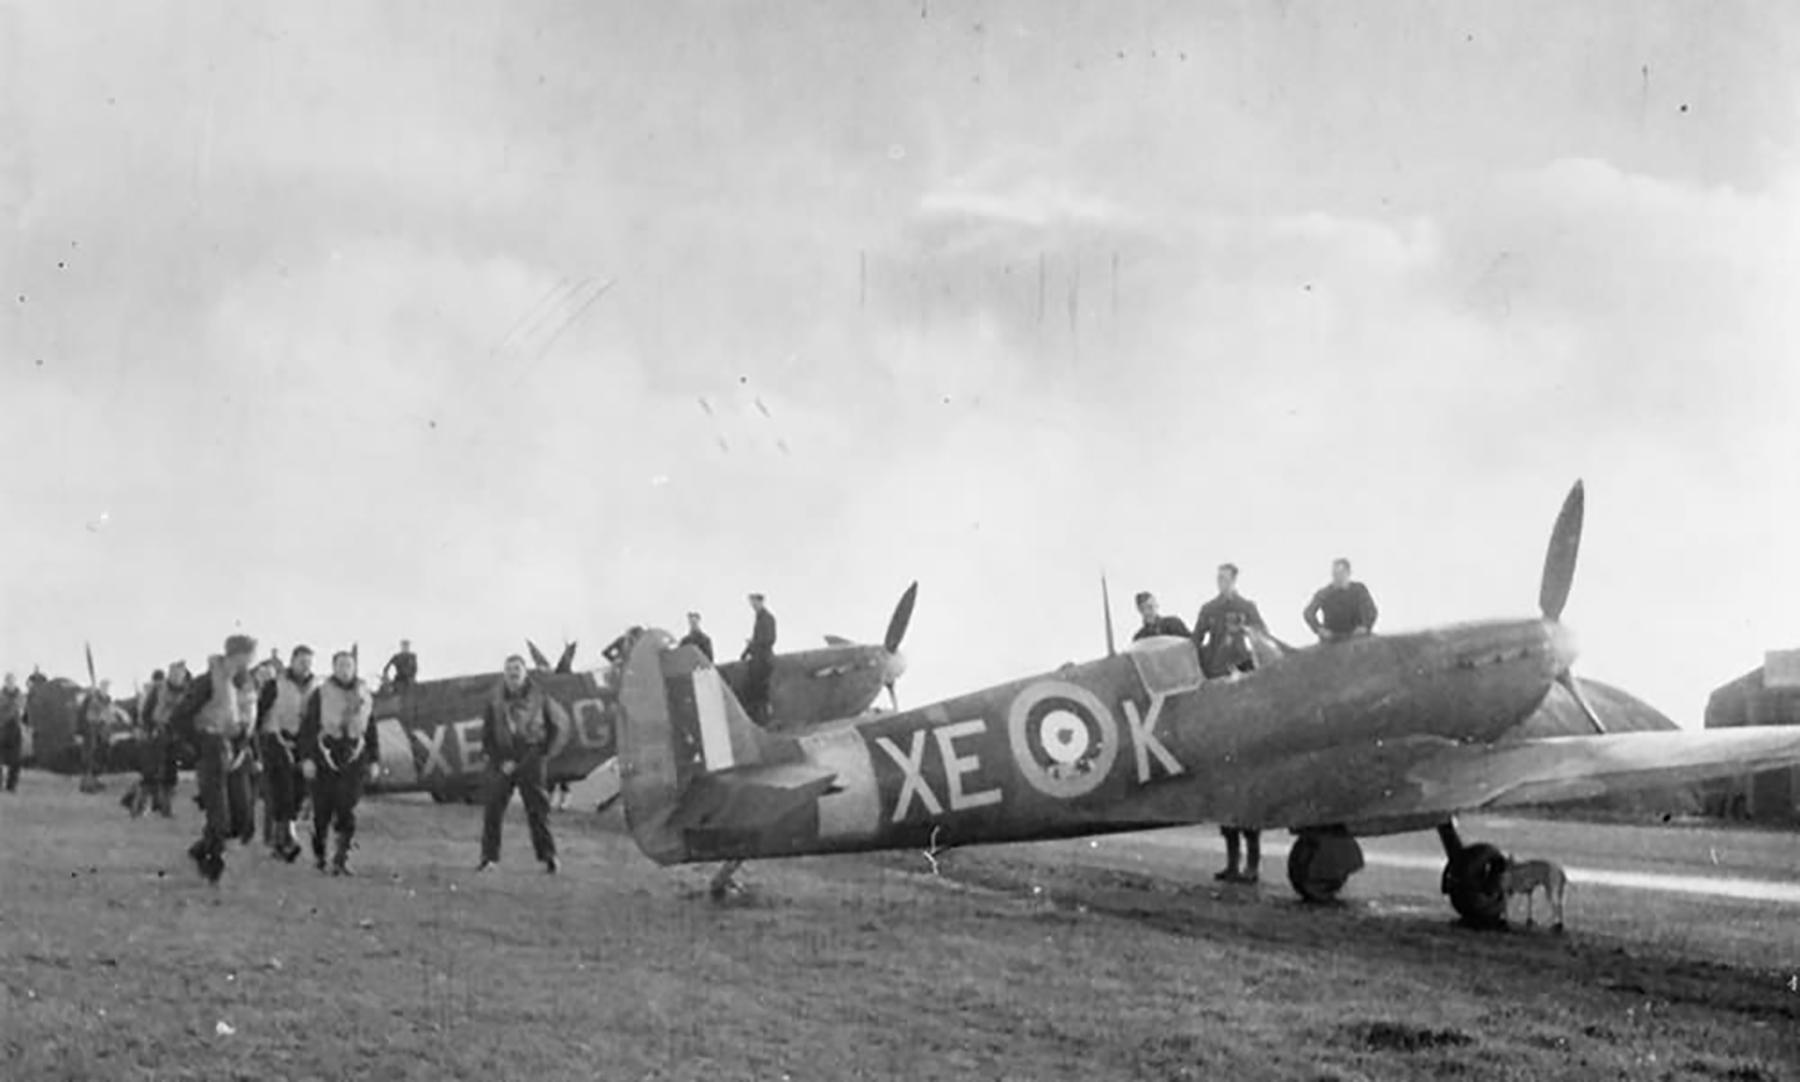 Spitfire MkIIa RAF 123Sqn XEK P7443 with XEG at Castletown England 1941 web 01